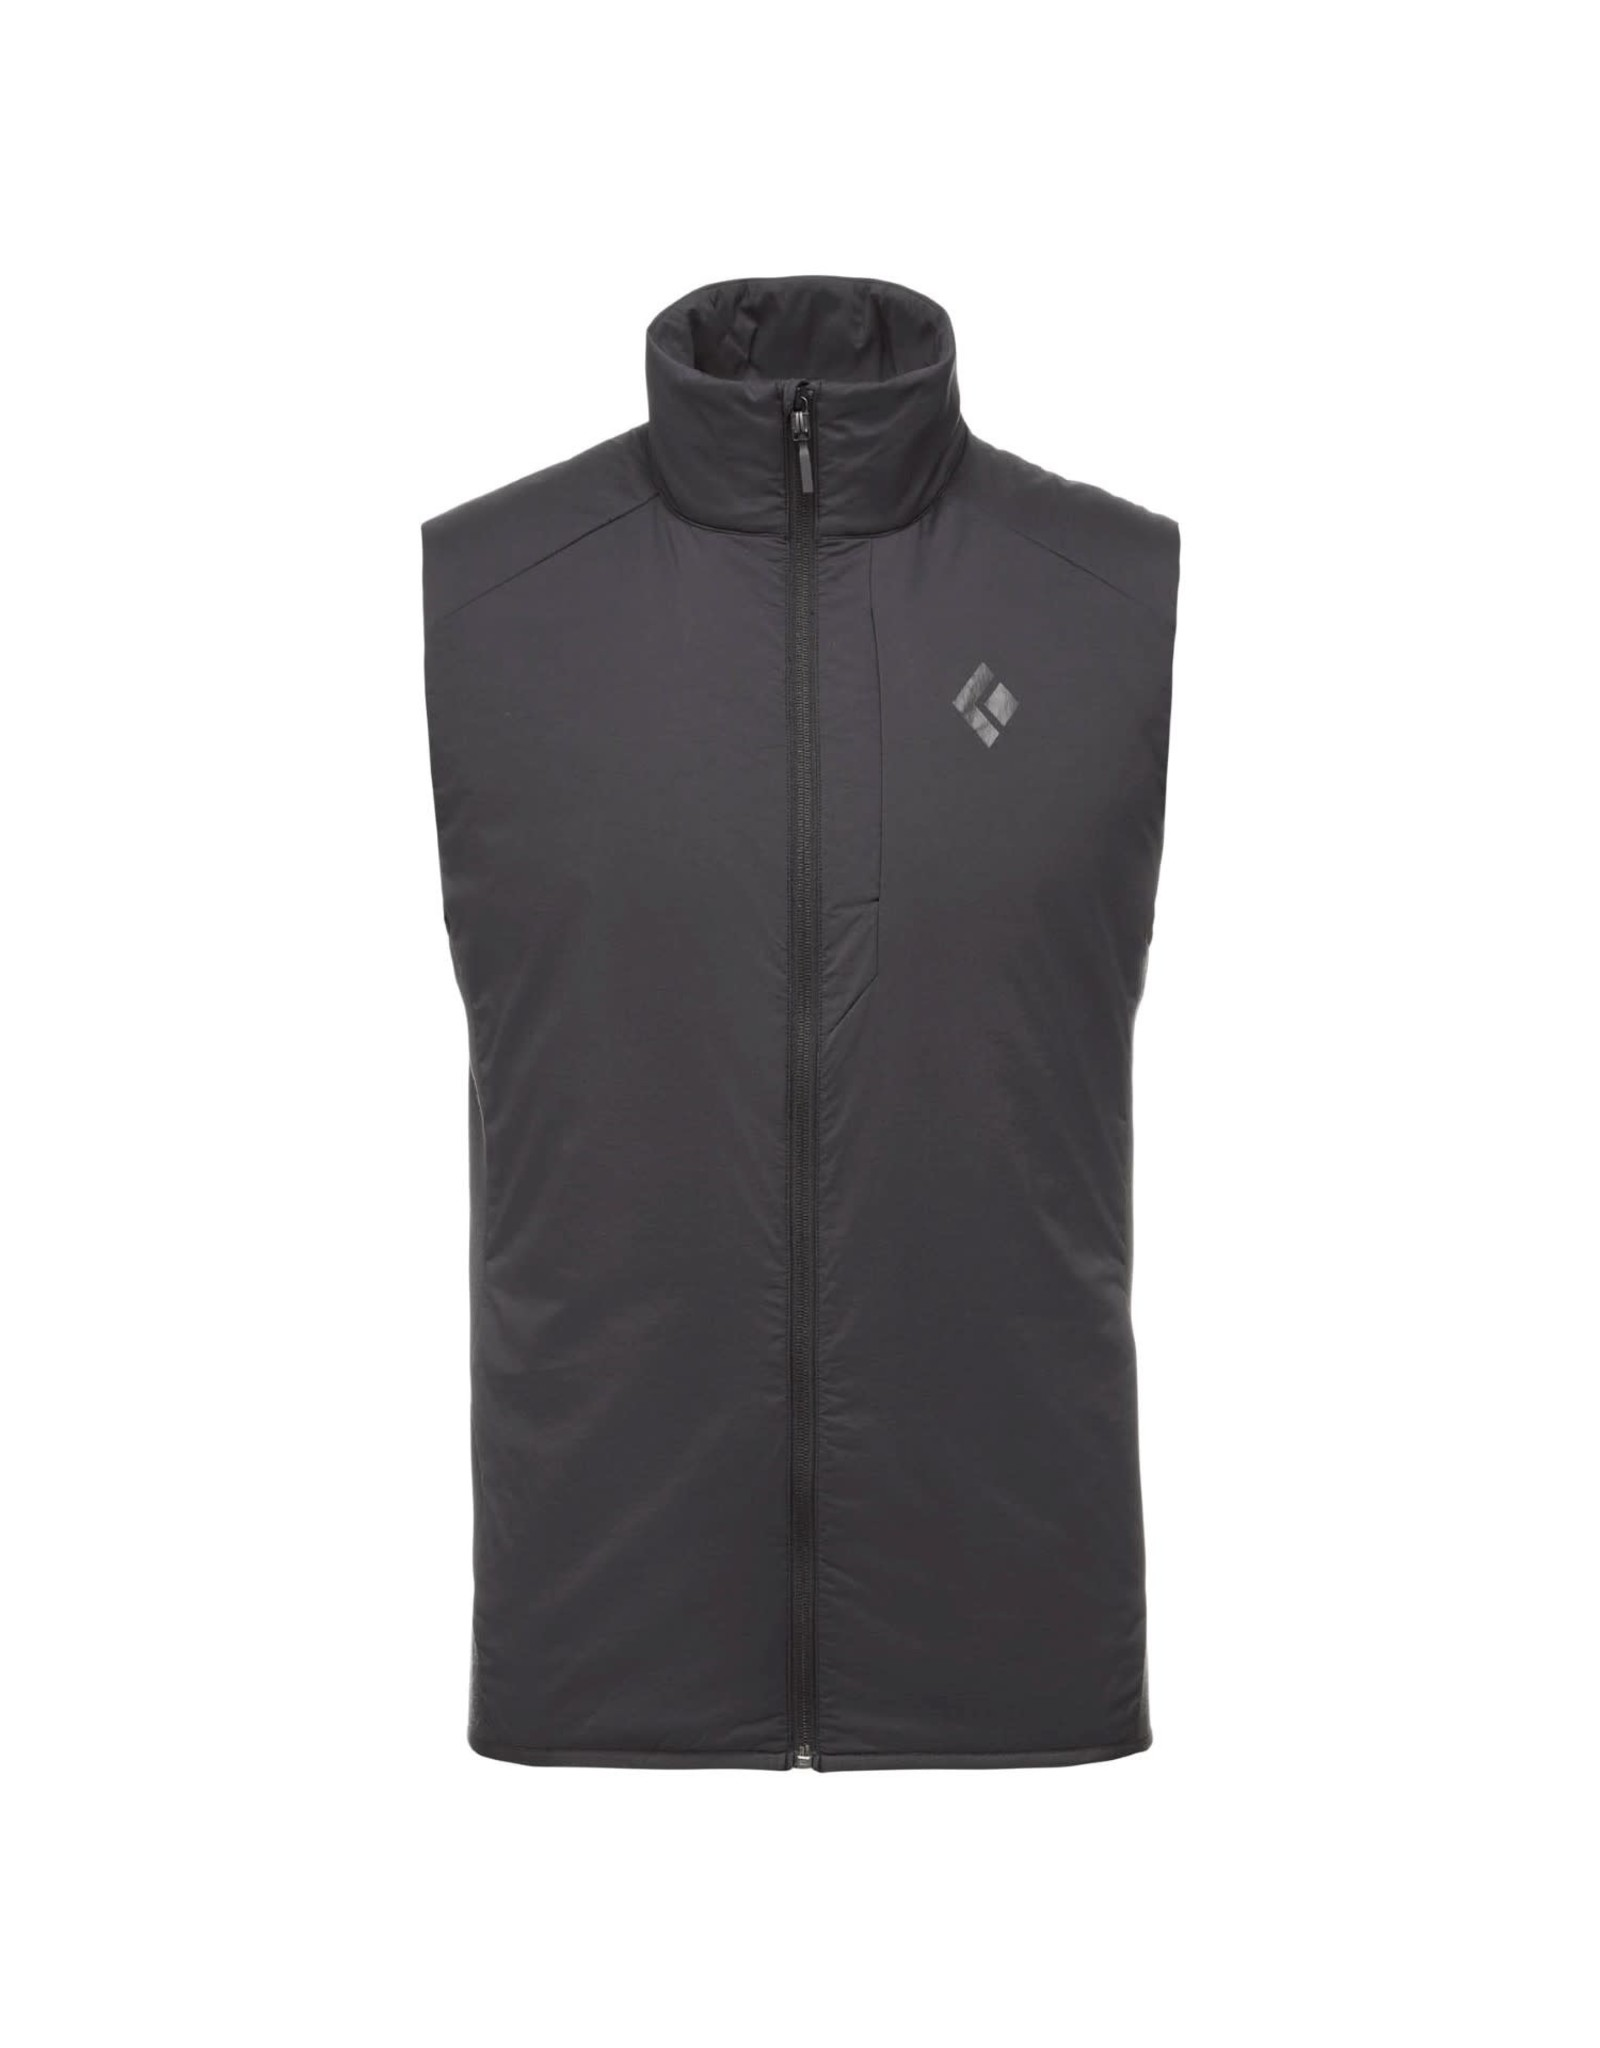 Black Diamond Black Diamond First Light Hybrid Vest - Men